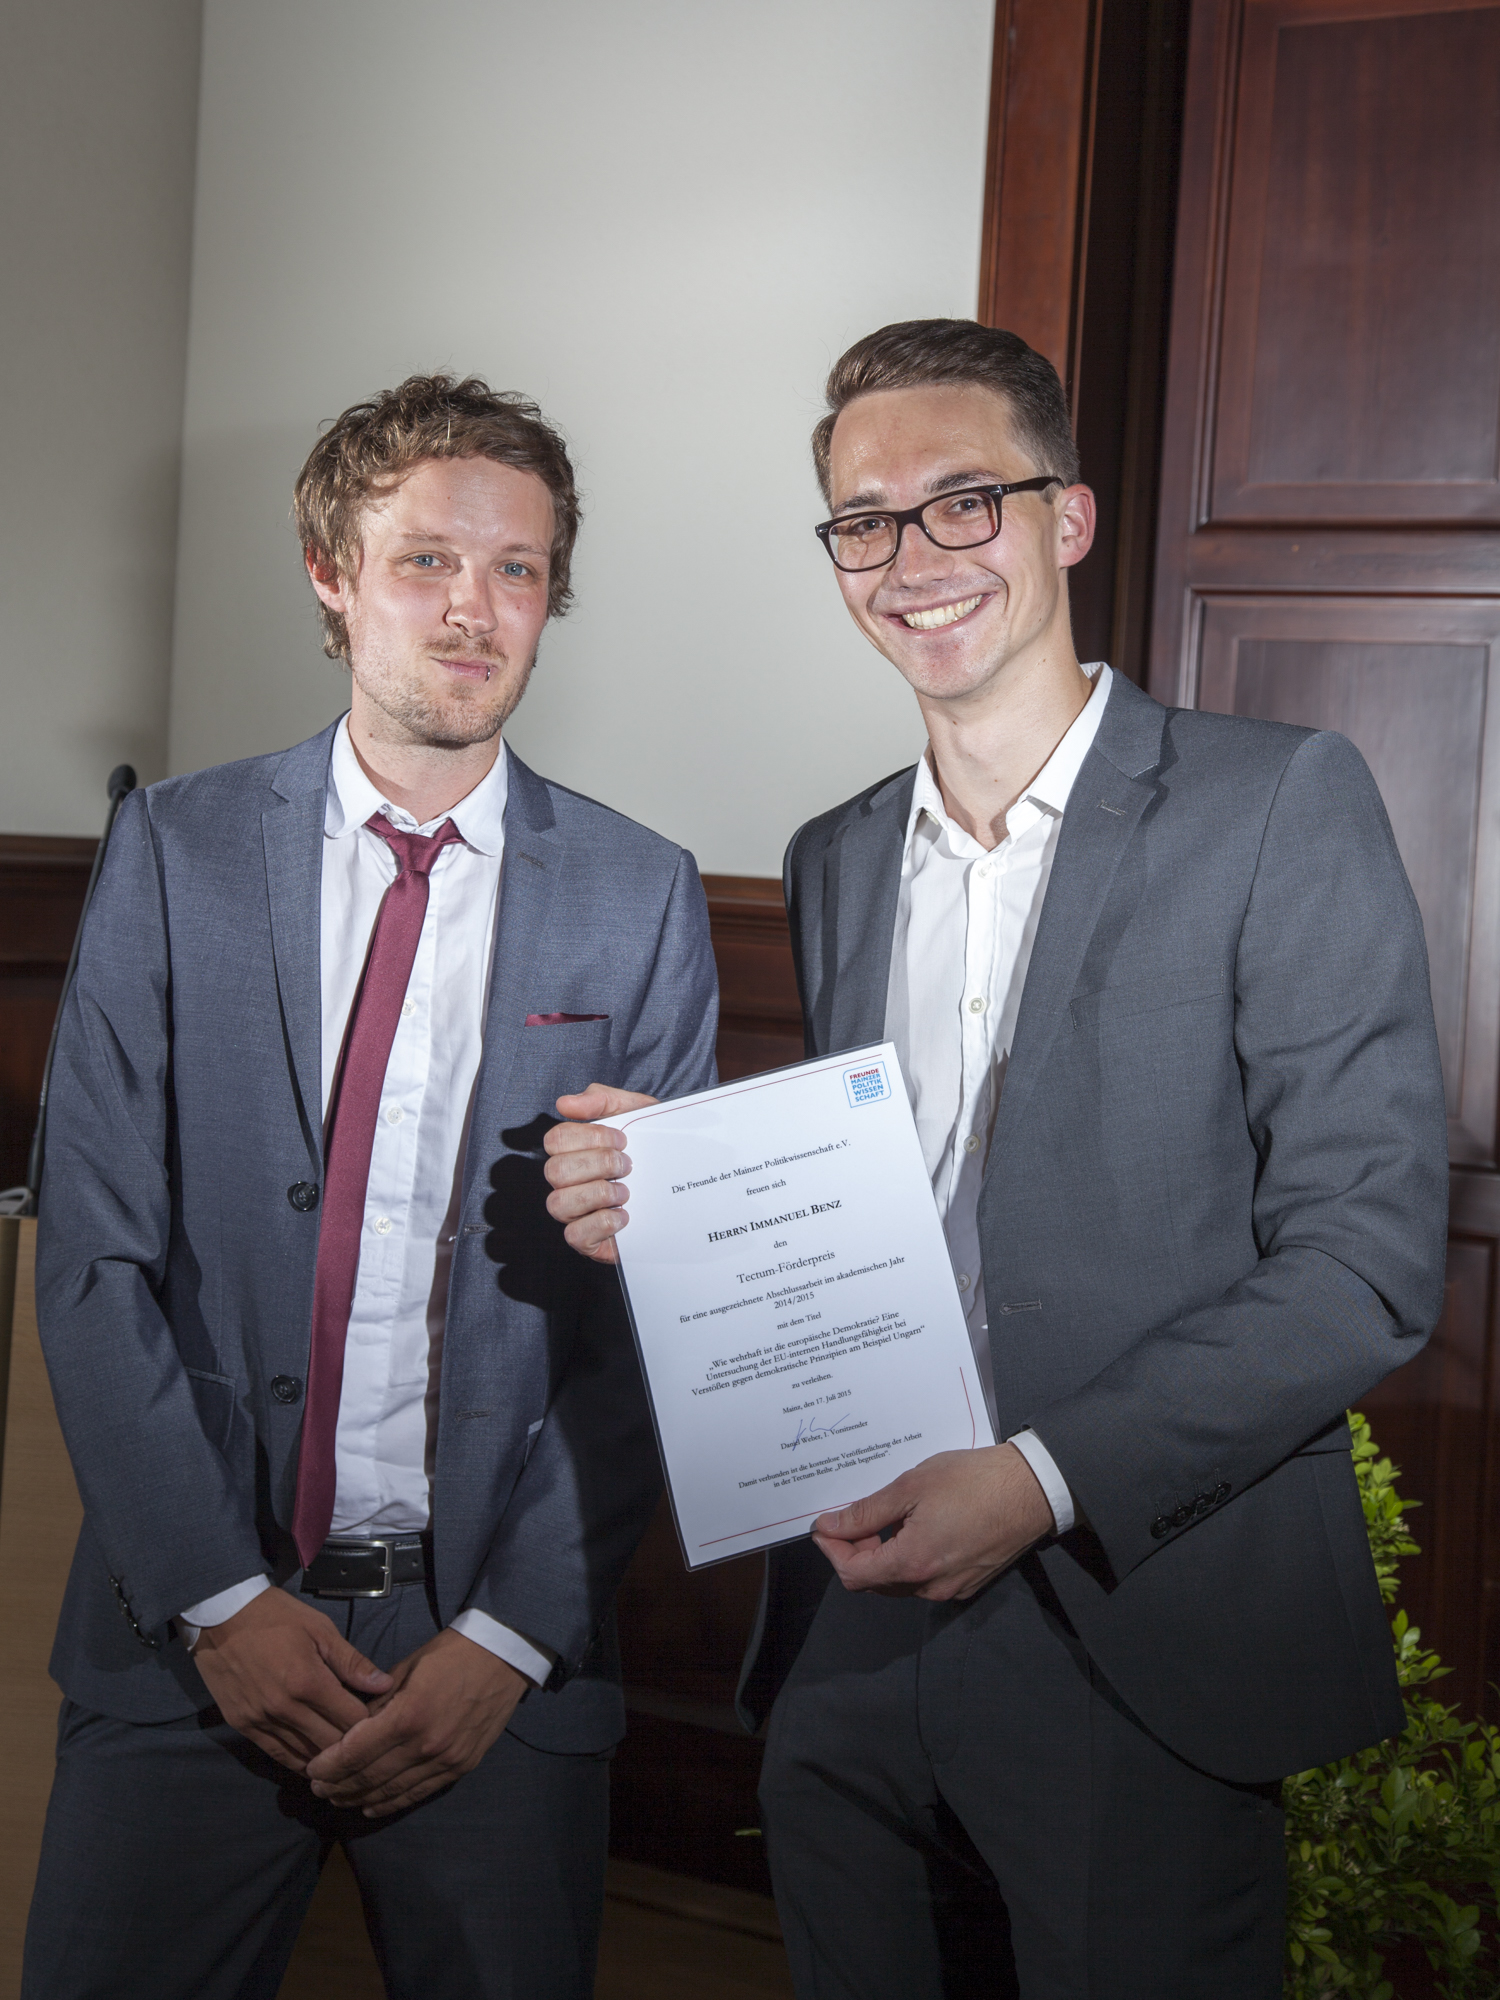 Abschlussfeier Politikwissenschaften (72)